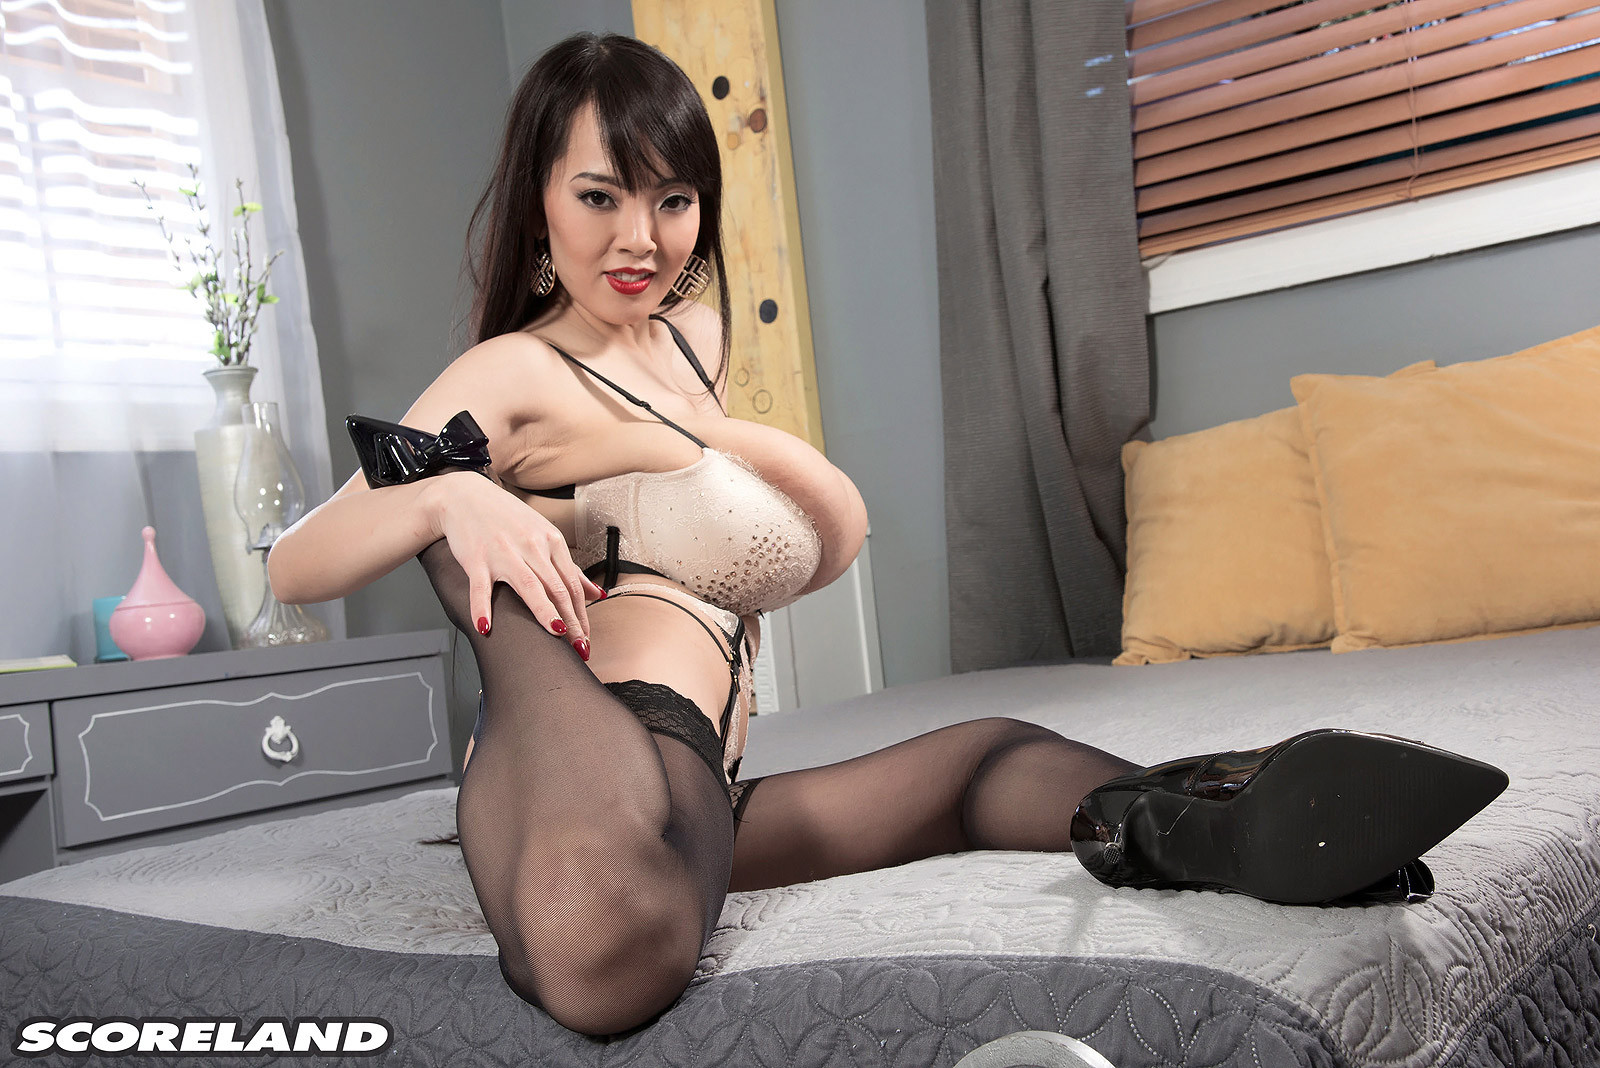 asian nude girl magazine